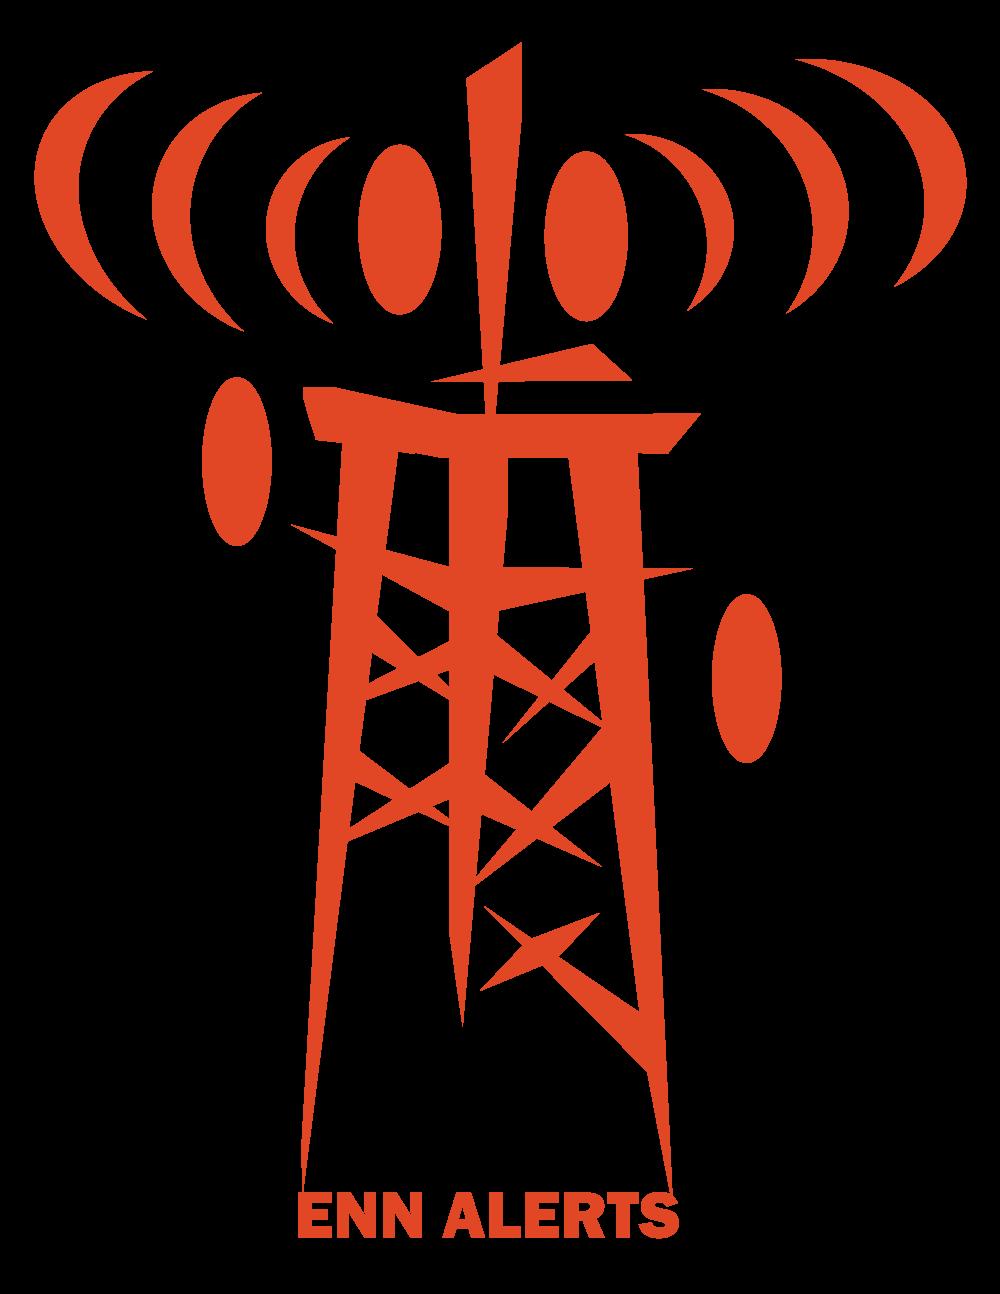 Emergency clipart emergency hotline. Notification network enn information